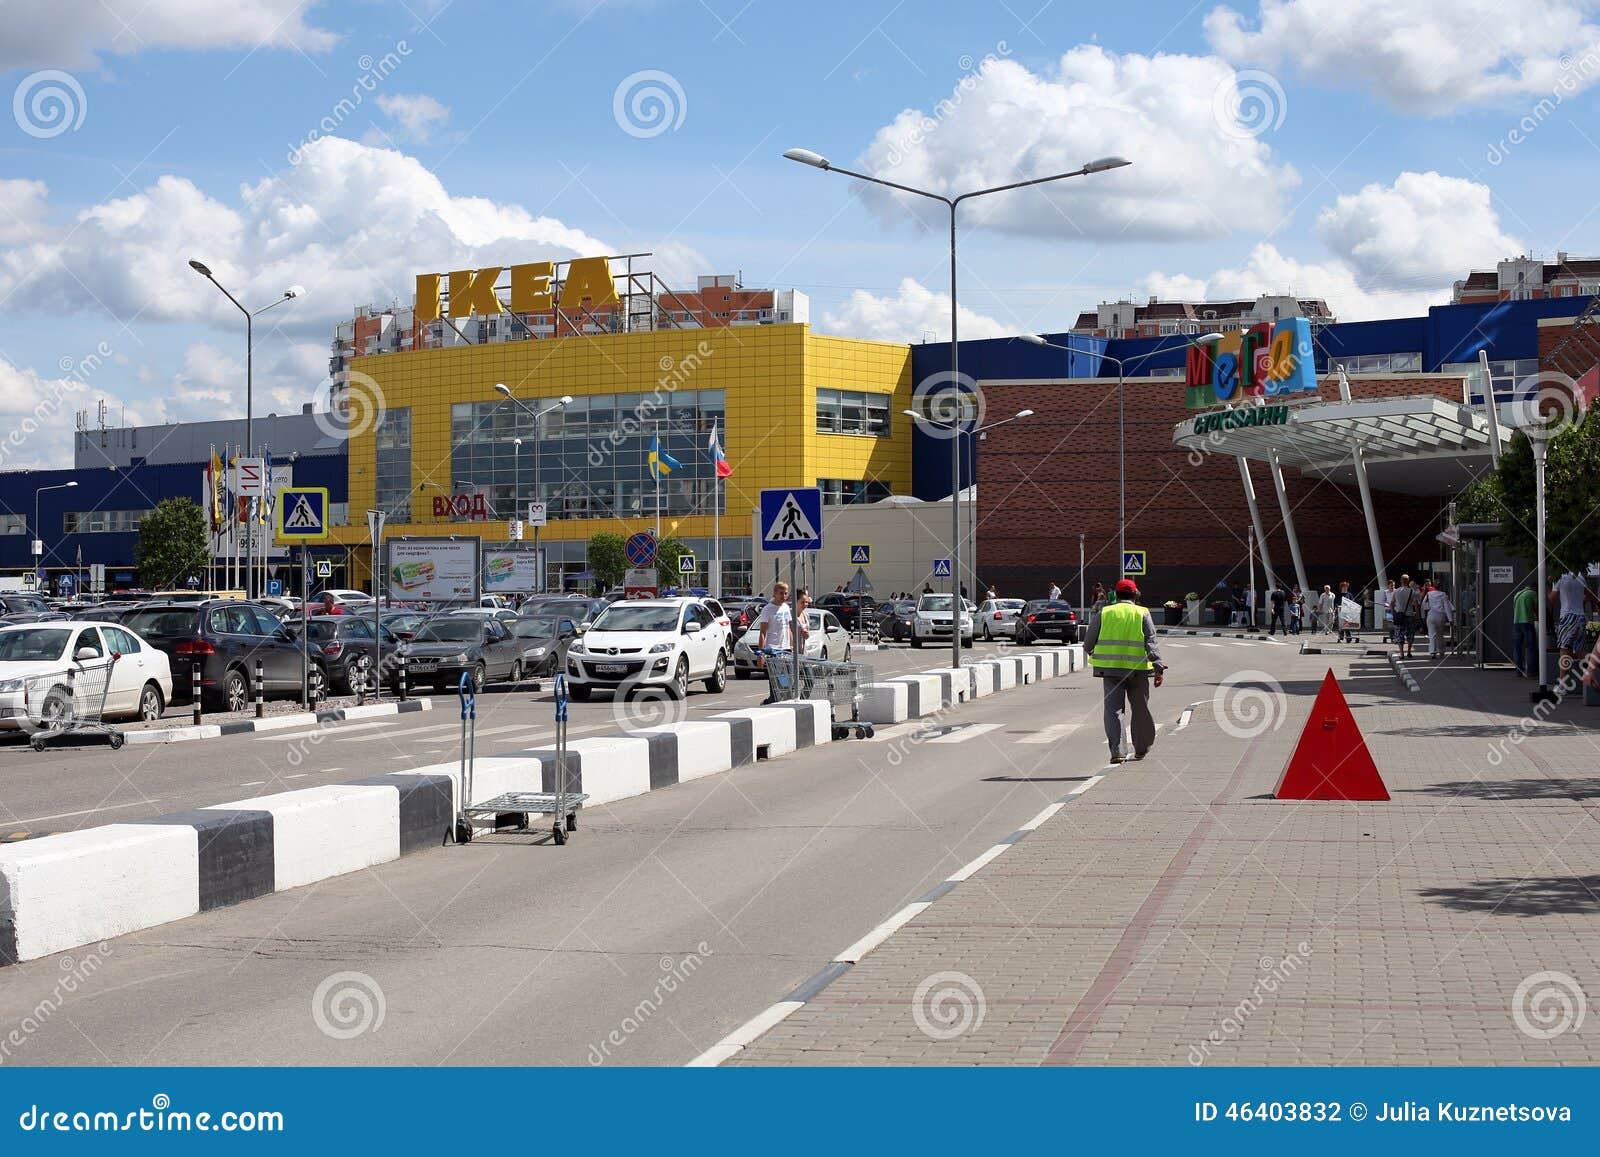 the road befor mega trade center in khimki city stock photography